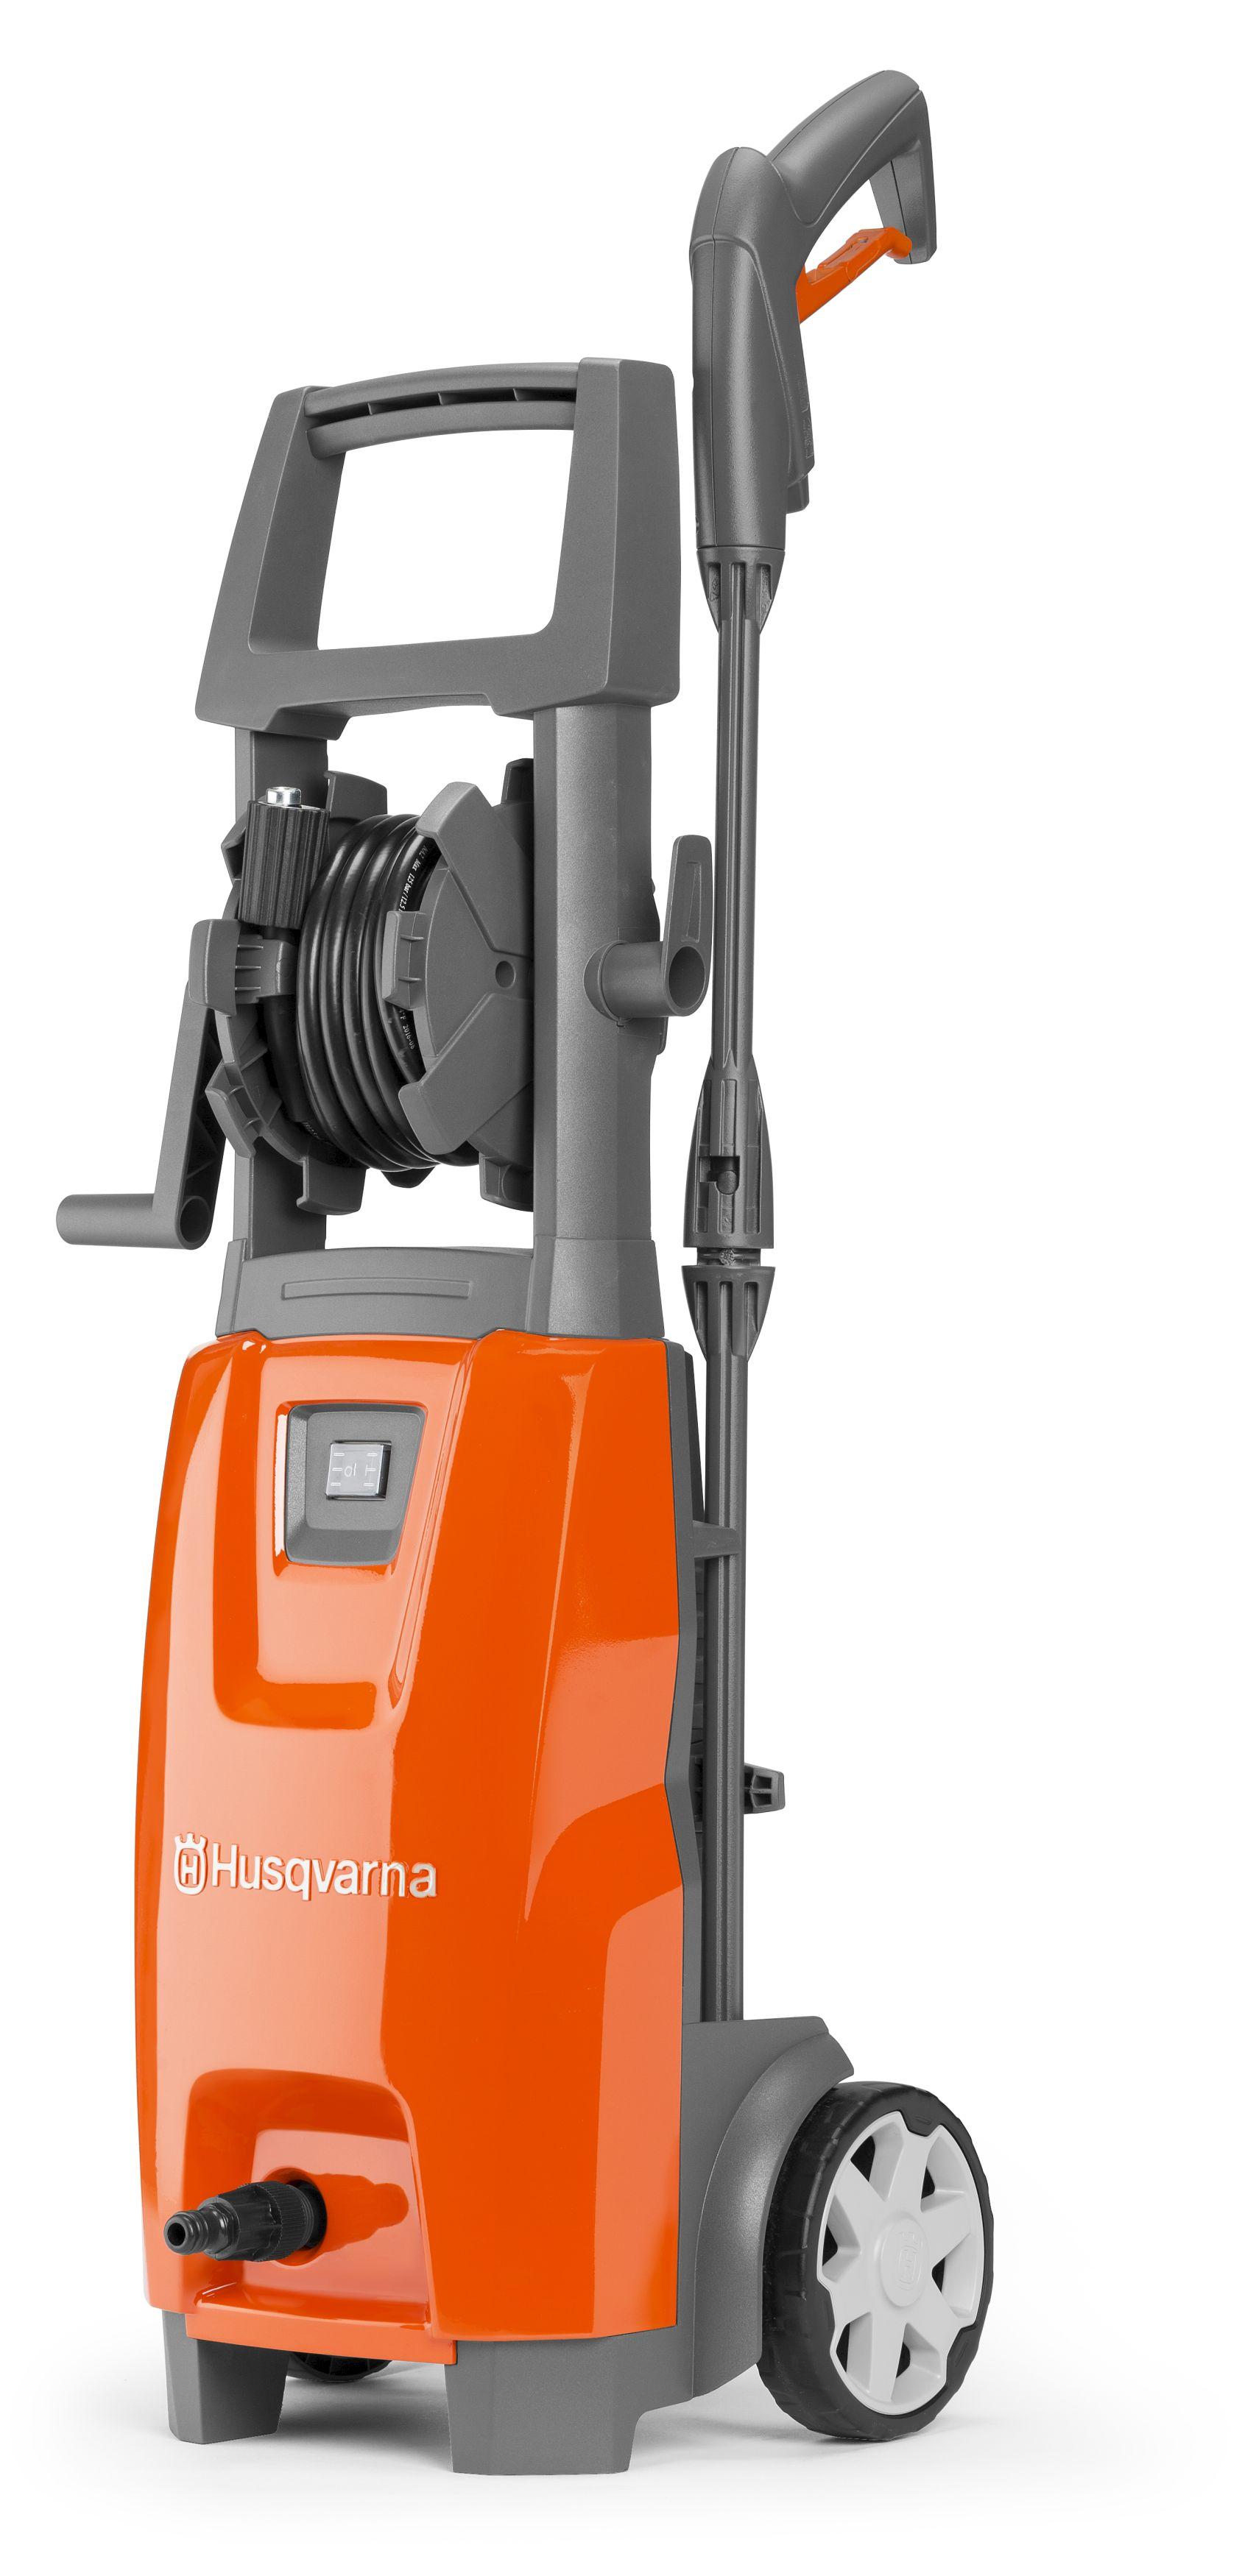 Husqvarna PW125 hogedrukreiniger 125 bar